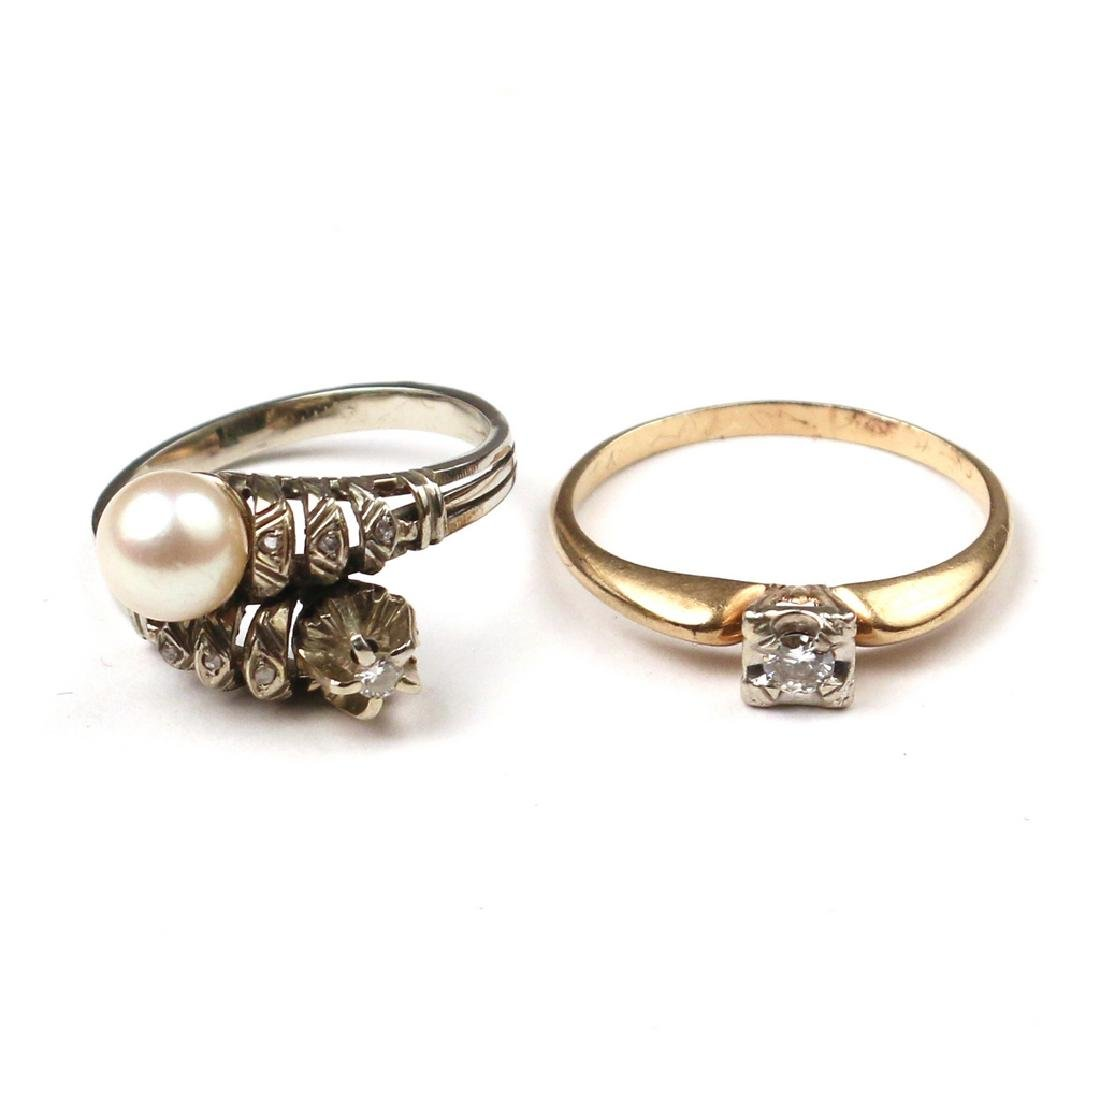 (2pc) MISC. DIAMOND & GEM RINGS